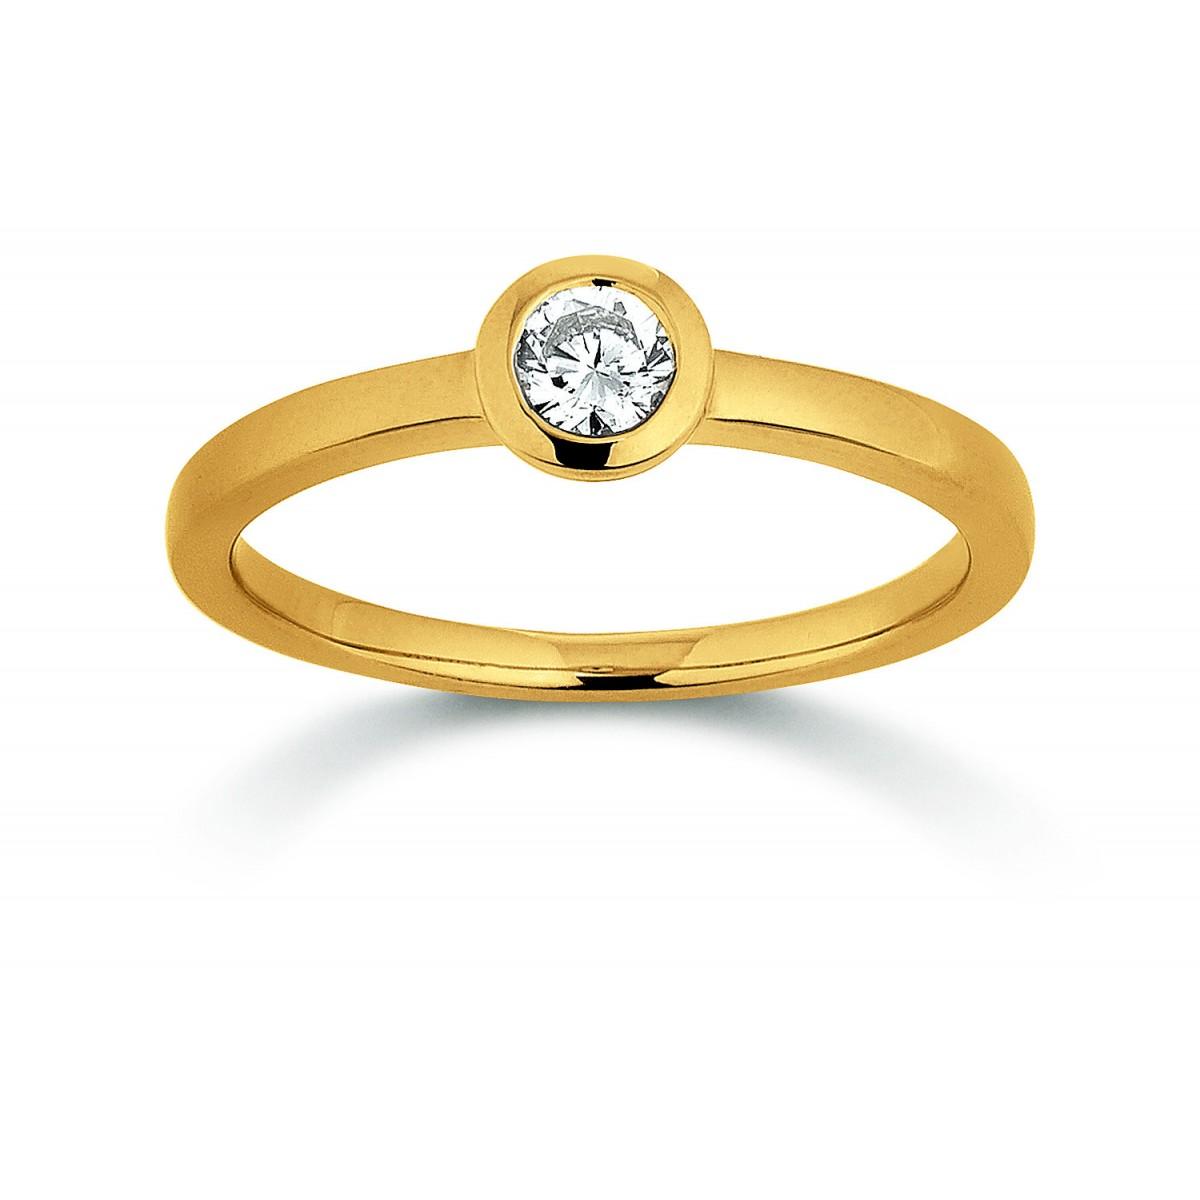 VIVENTYJewels – Der ring – 781421